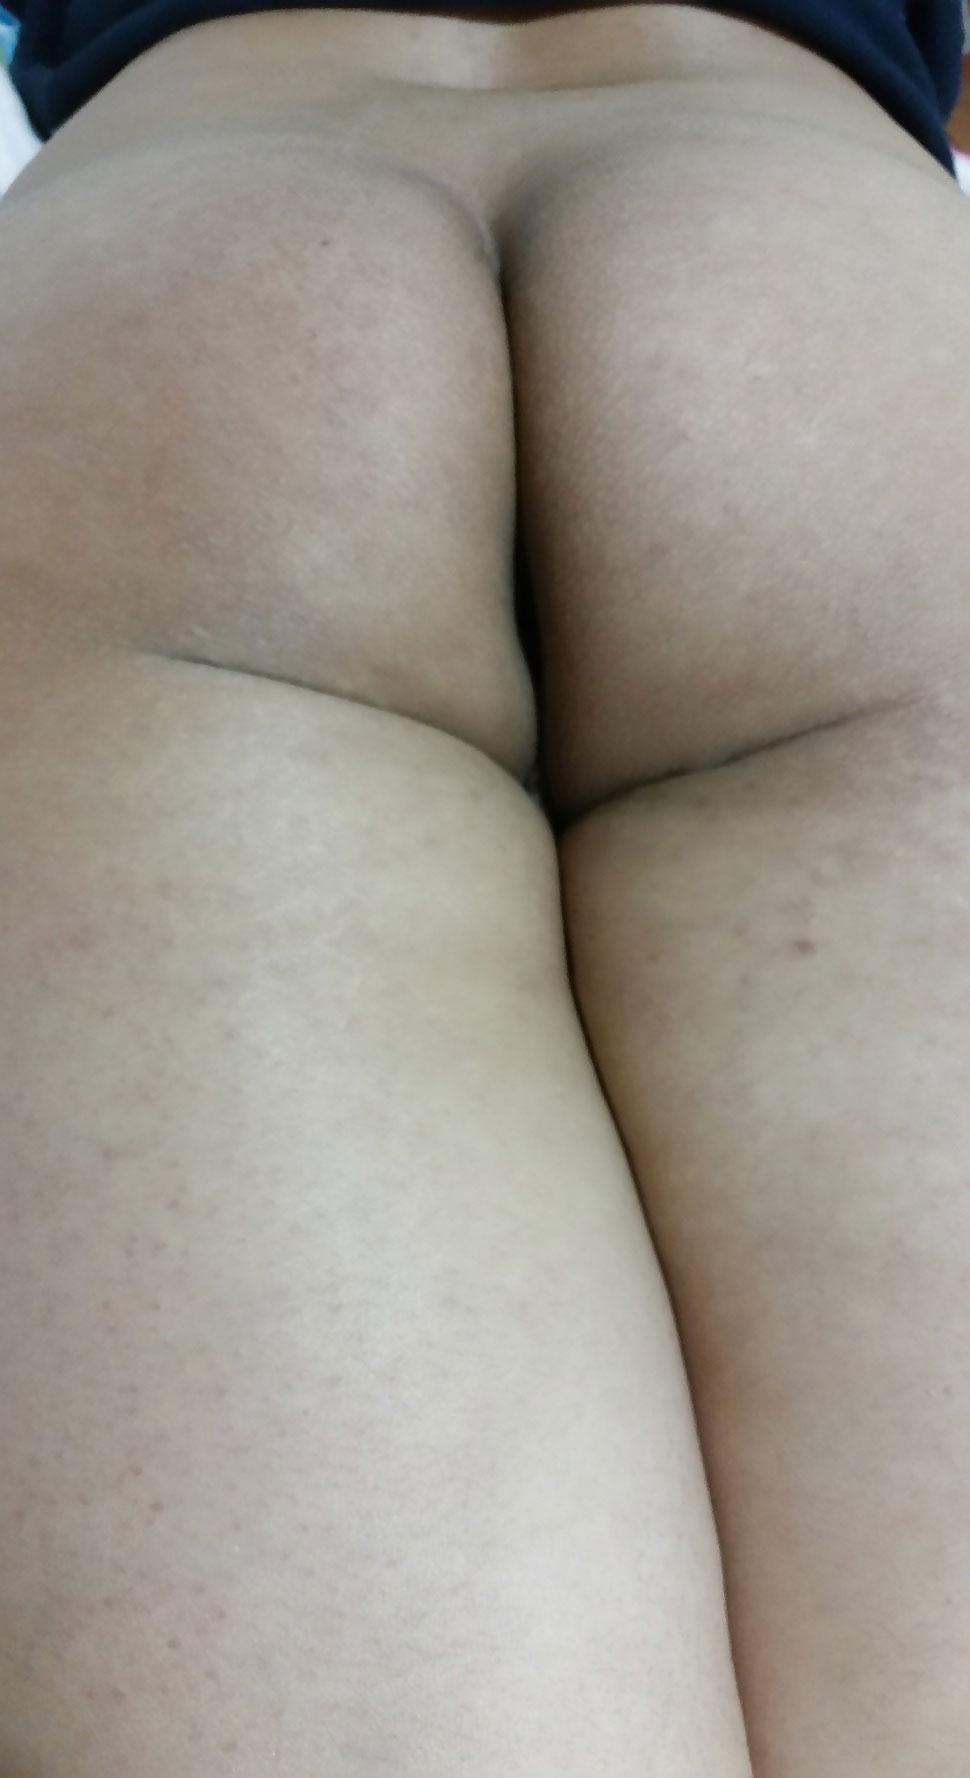 lesbian blonde twins nude